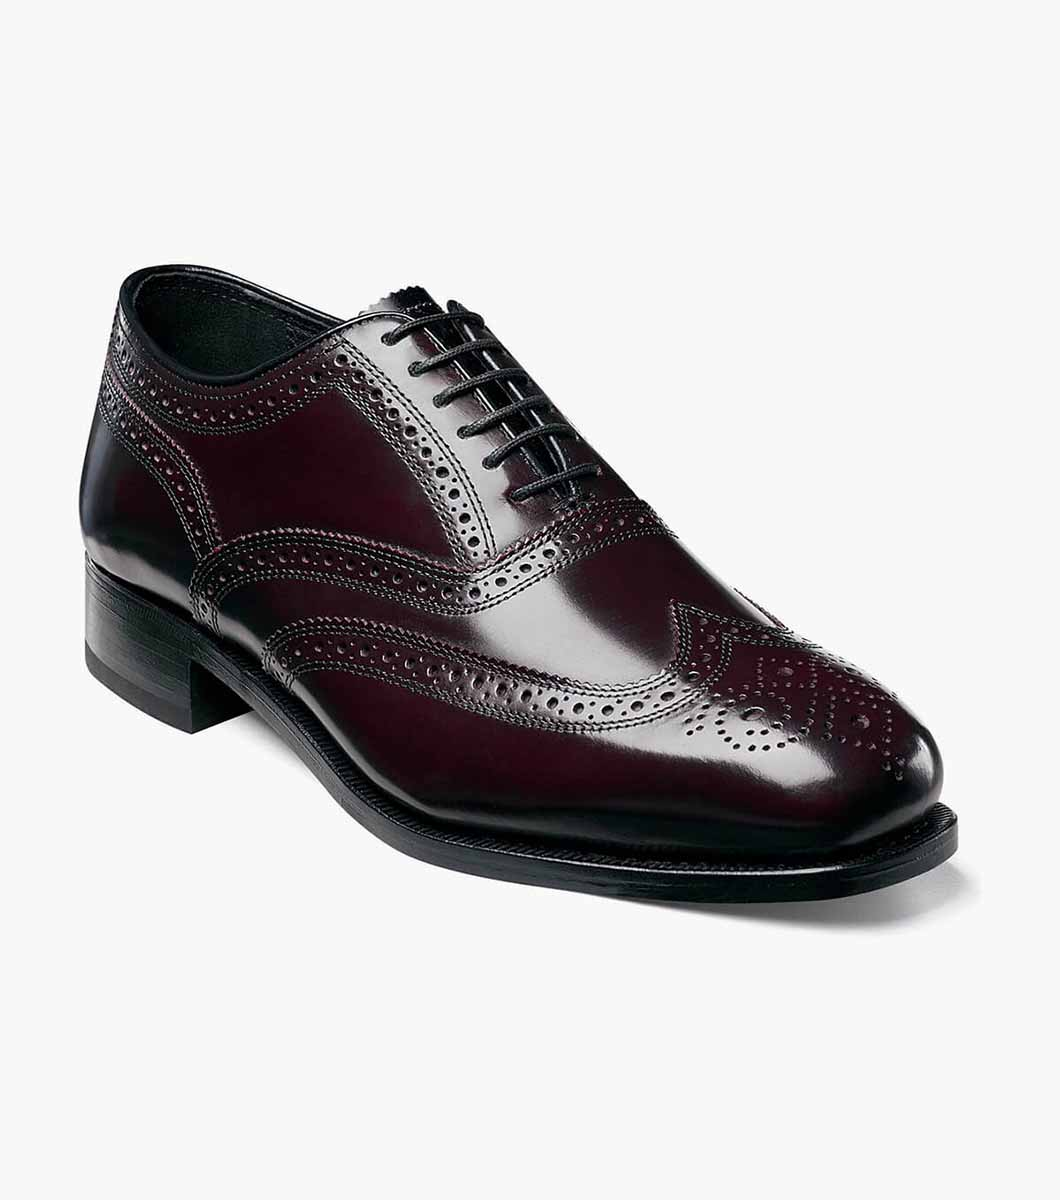 Lexington Wingtip Leather Classic Oxford